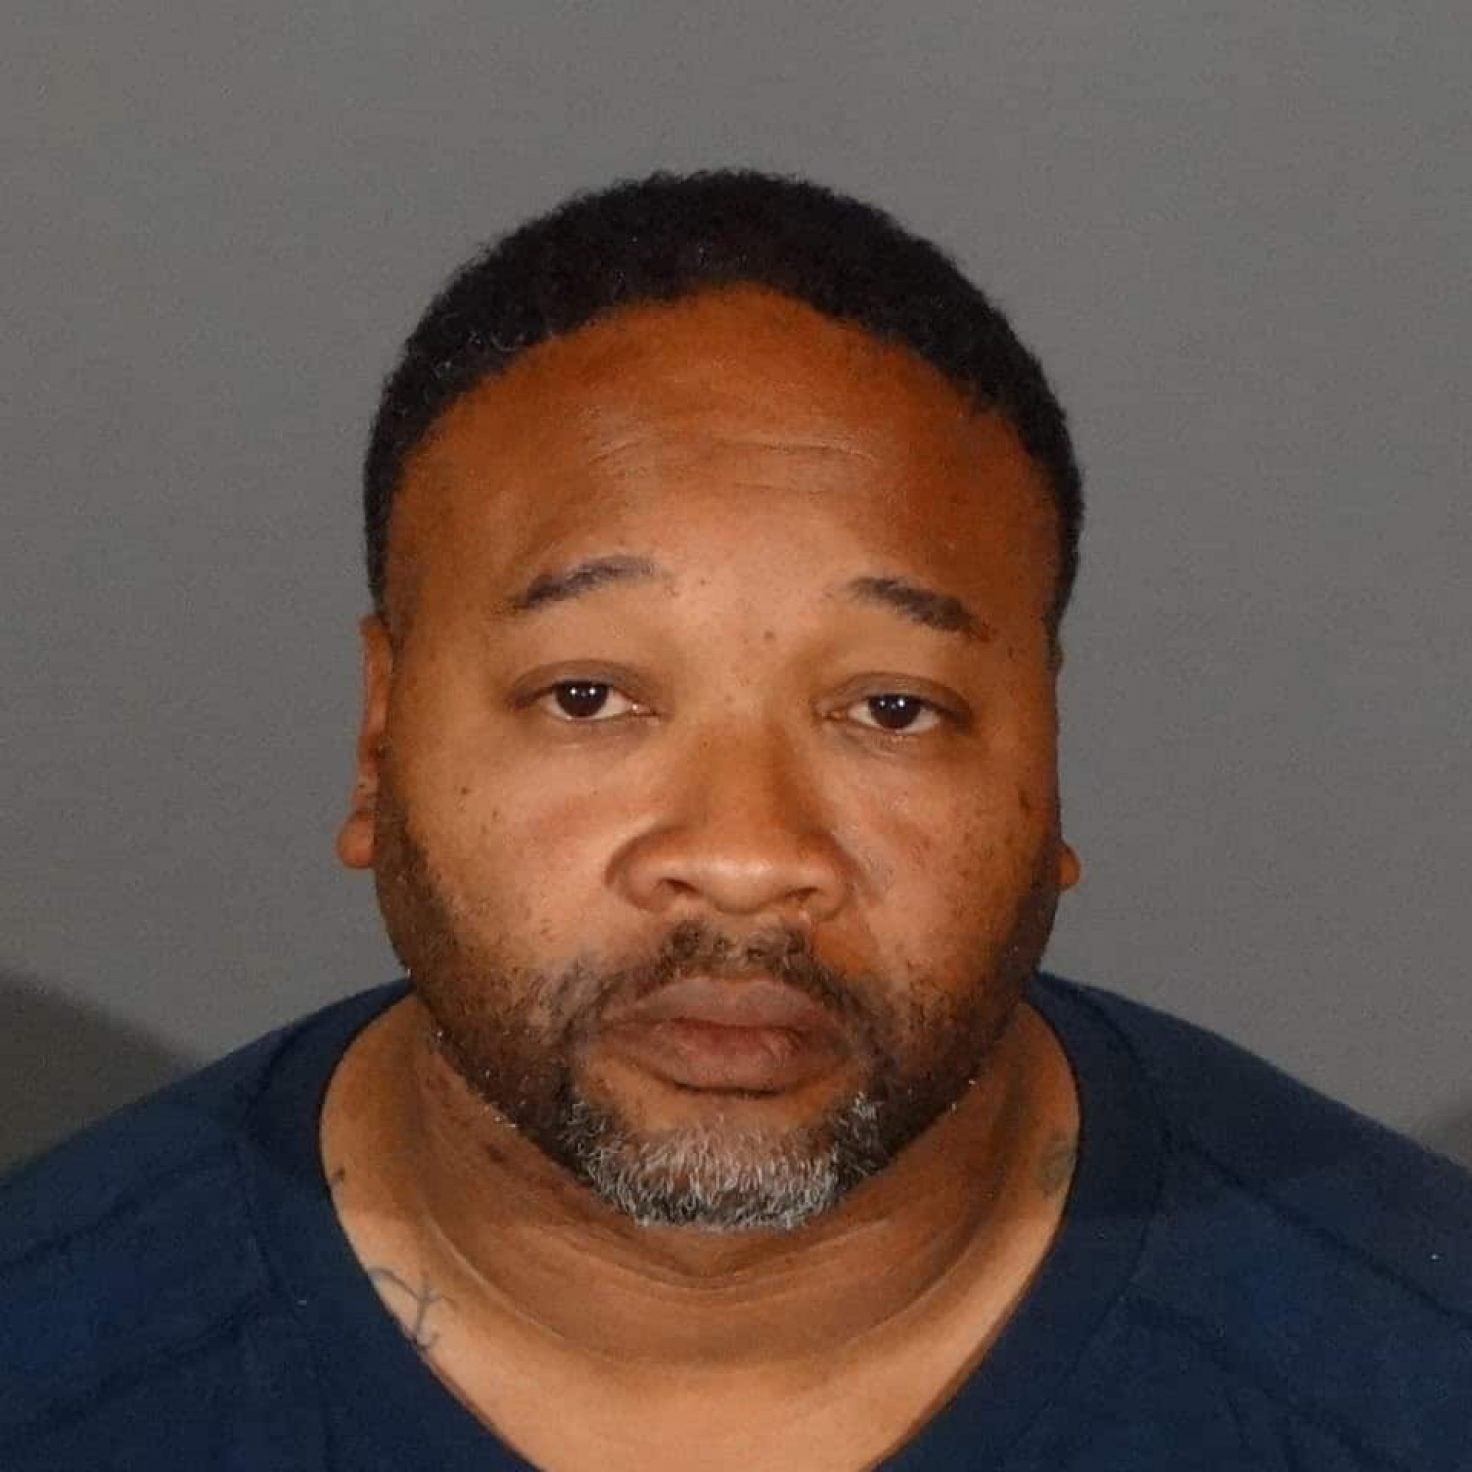 Trinity Love Jones Update: Boyfriend Of Deceased Child's Mother Charged With Murder In Hacienda Heights Case